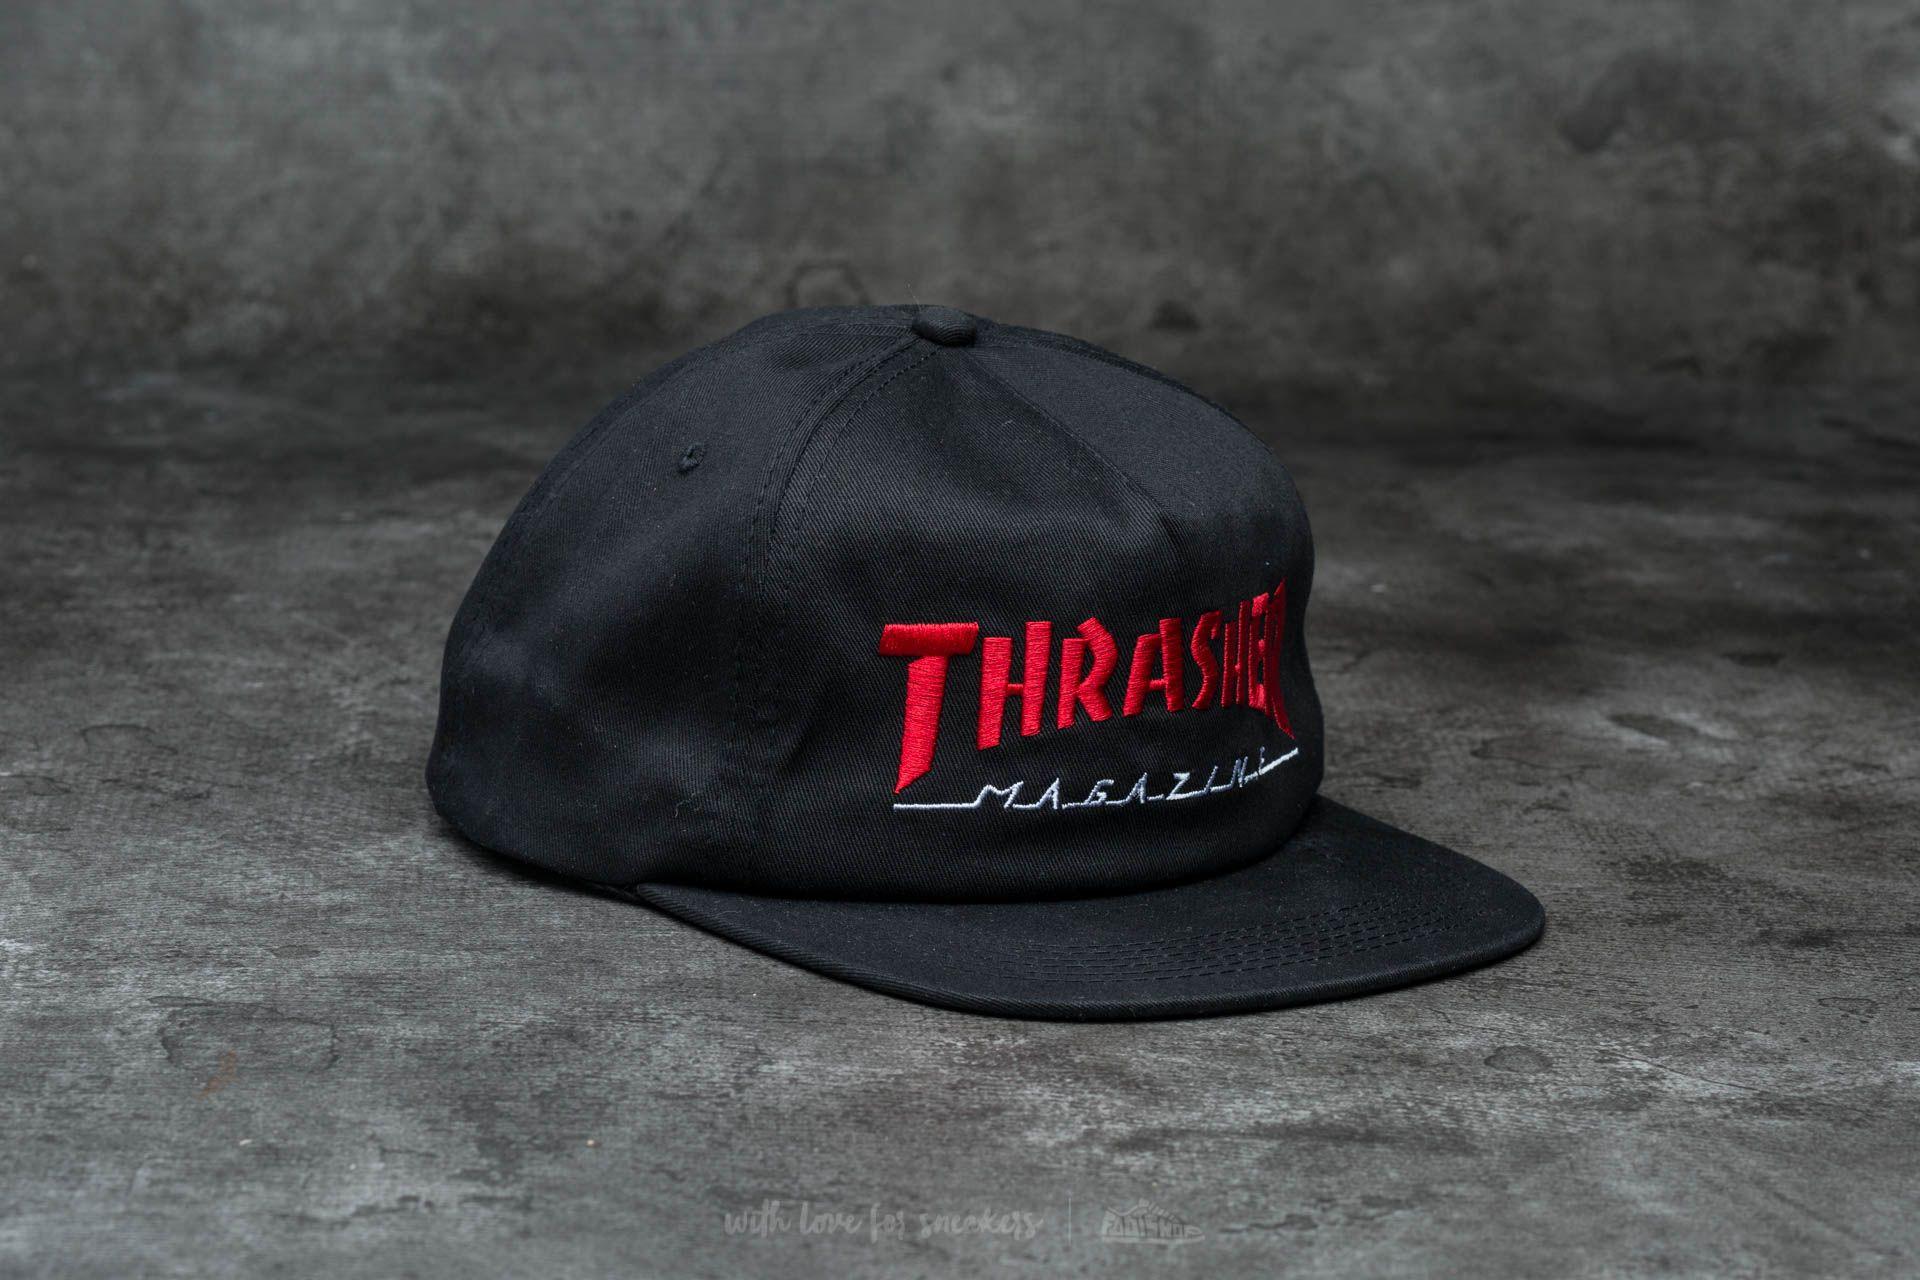 7fdc45fc43e Thrasher Magazine Logo Two-Tone Hat Black  Red